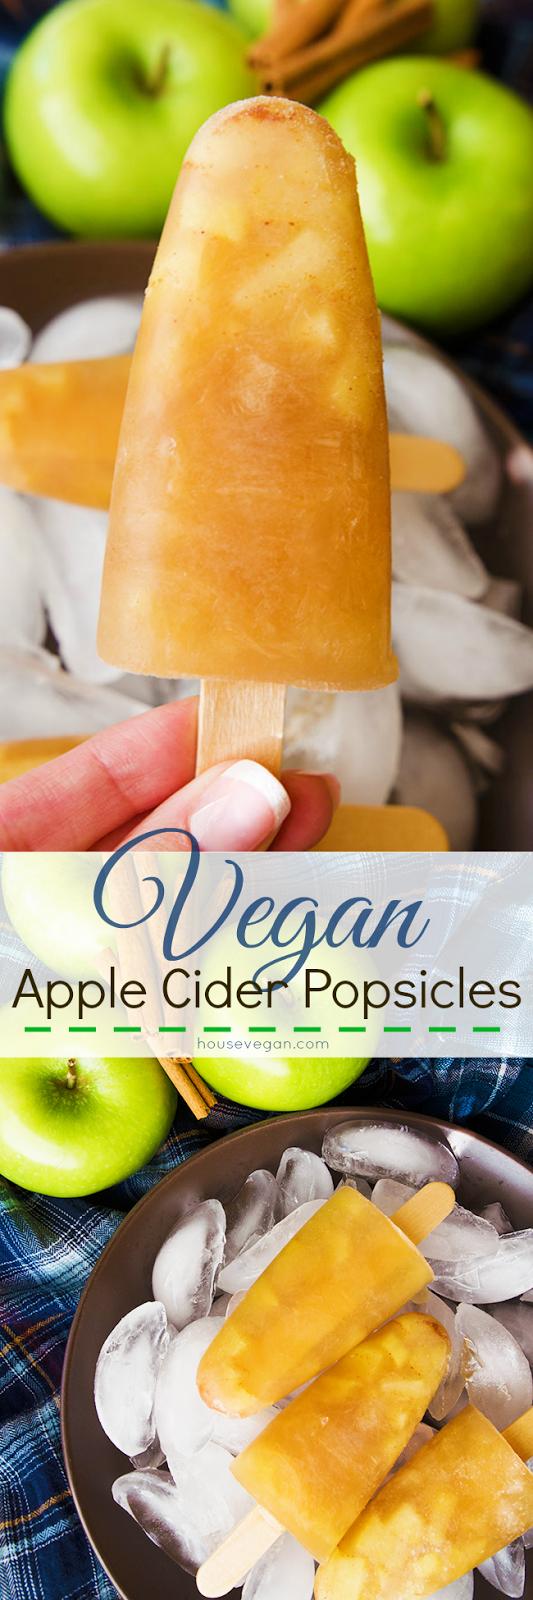 apple cider popsicle recipe, apple cider popsicles, apple cider popsicle recipe, apple cider popsicles, apple cinnamon popsicle, apple fruit popsicles, apple juice popsicles, apple juice popsicles recipe, apple pie popsicle recipe, apple popsicle sticks, apple popsicles, apple popsicles recipe, diy apple juice popsicles, green apple popsicle recipe, green apple popsicles, homemade apple popsicles, popsicles apple juice, popsicles from apple juice, popsicles with apple juice, fall popsicles, easy vegan fall desserts, vegan autumn desserts, vegan fall desserts, vegan gluten free fall desserts, best vegan fall desserts, easy vegan fall desserts, healthy vegan fall desserts, healthy vegan fall recipes, vegan desserts for fall, vegan fall baking, vegan fall comfort food, vegan fall dessert recipes, vegan fall desserts, vegan fall food, vegan fall recipes, vegan fall treats, autumn vegan dishes, healthy vegan autumn recipes, vegan autumn desserts, vegan autumn food, vegan autumn recipes, vegan fall baking, vegan fall baking recipes, vegan fall dessert recipes, vegan fall desserts, vegan in autumn